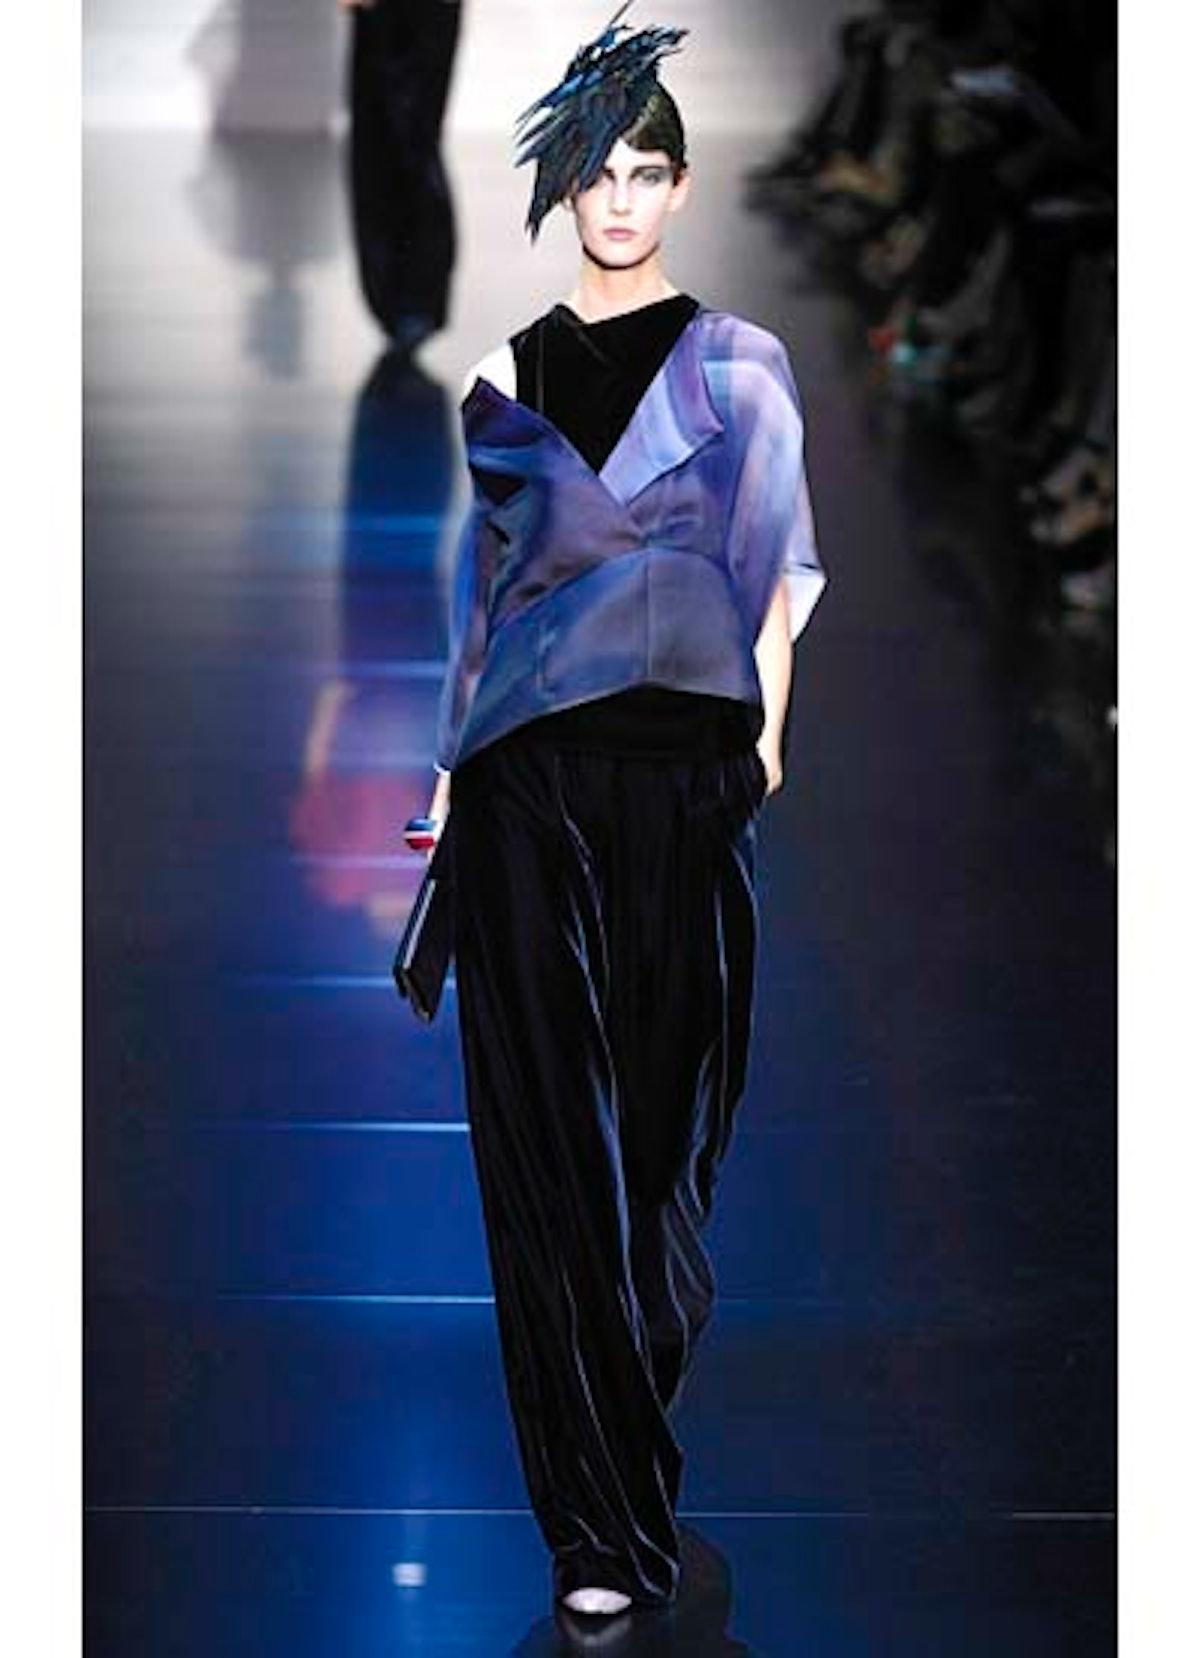 fass-giorgio-armani-couture-2012-runway-27-v.jpg